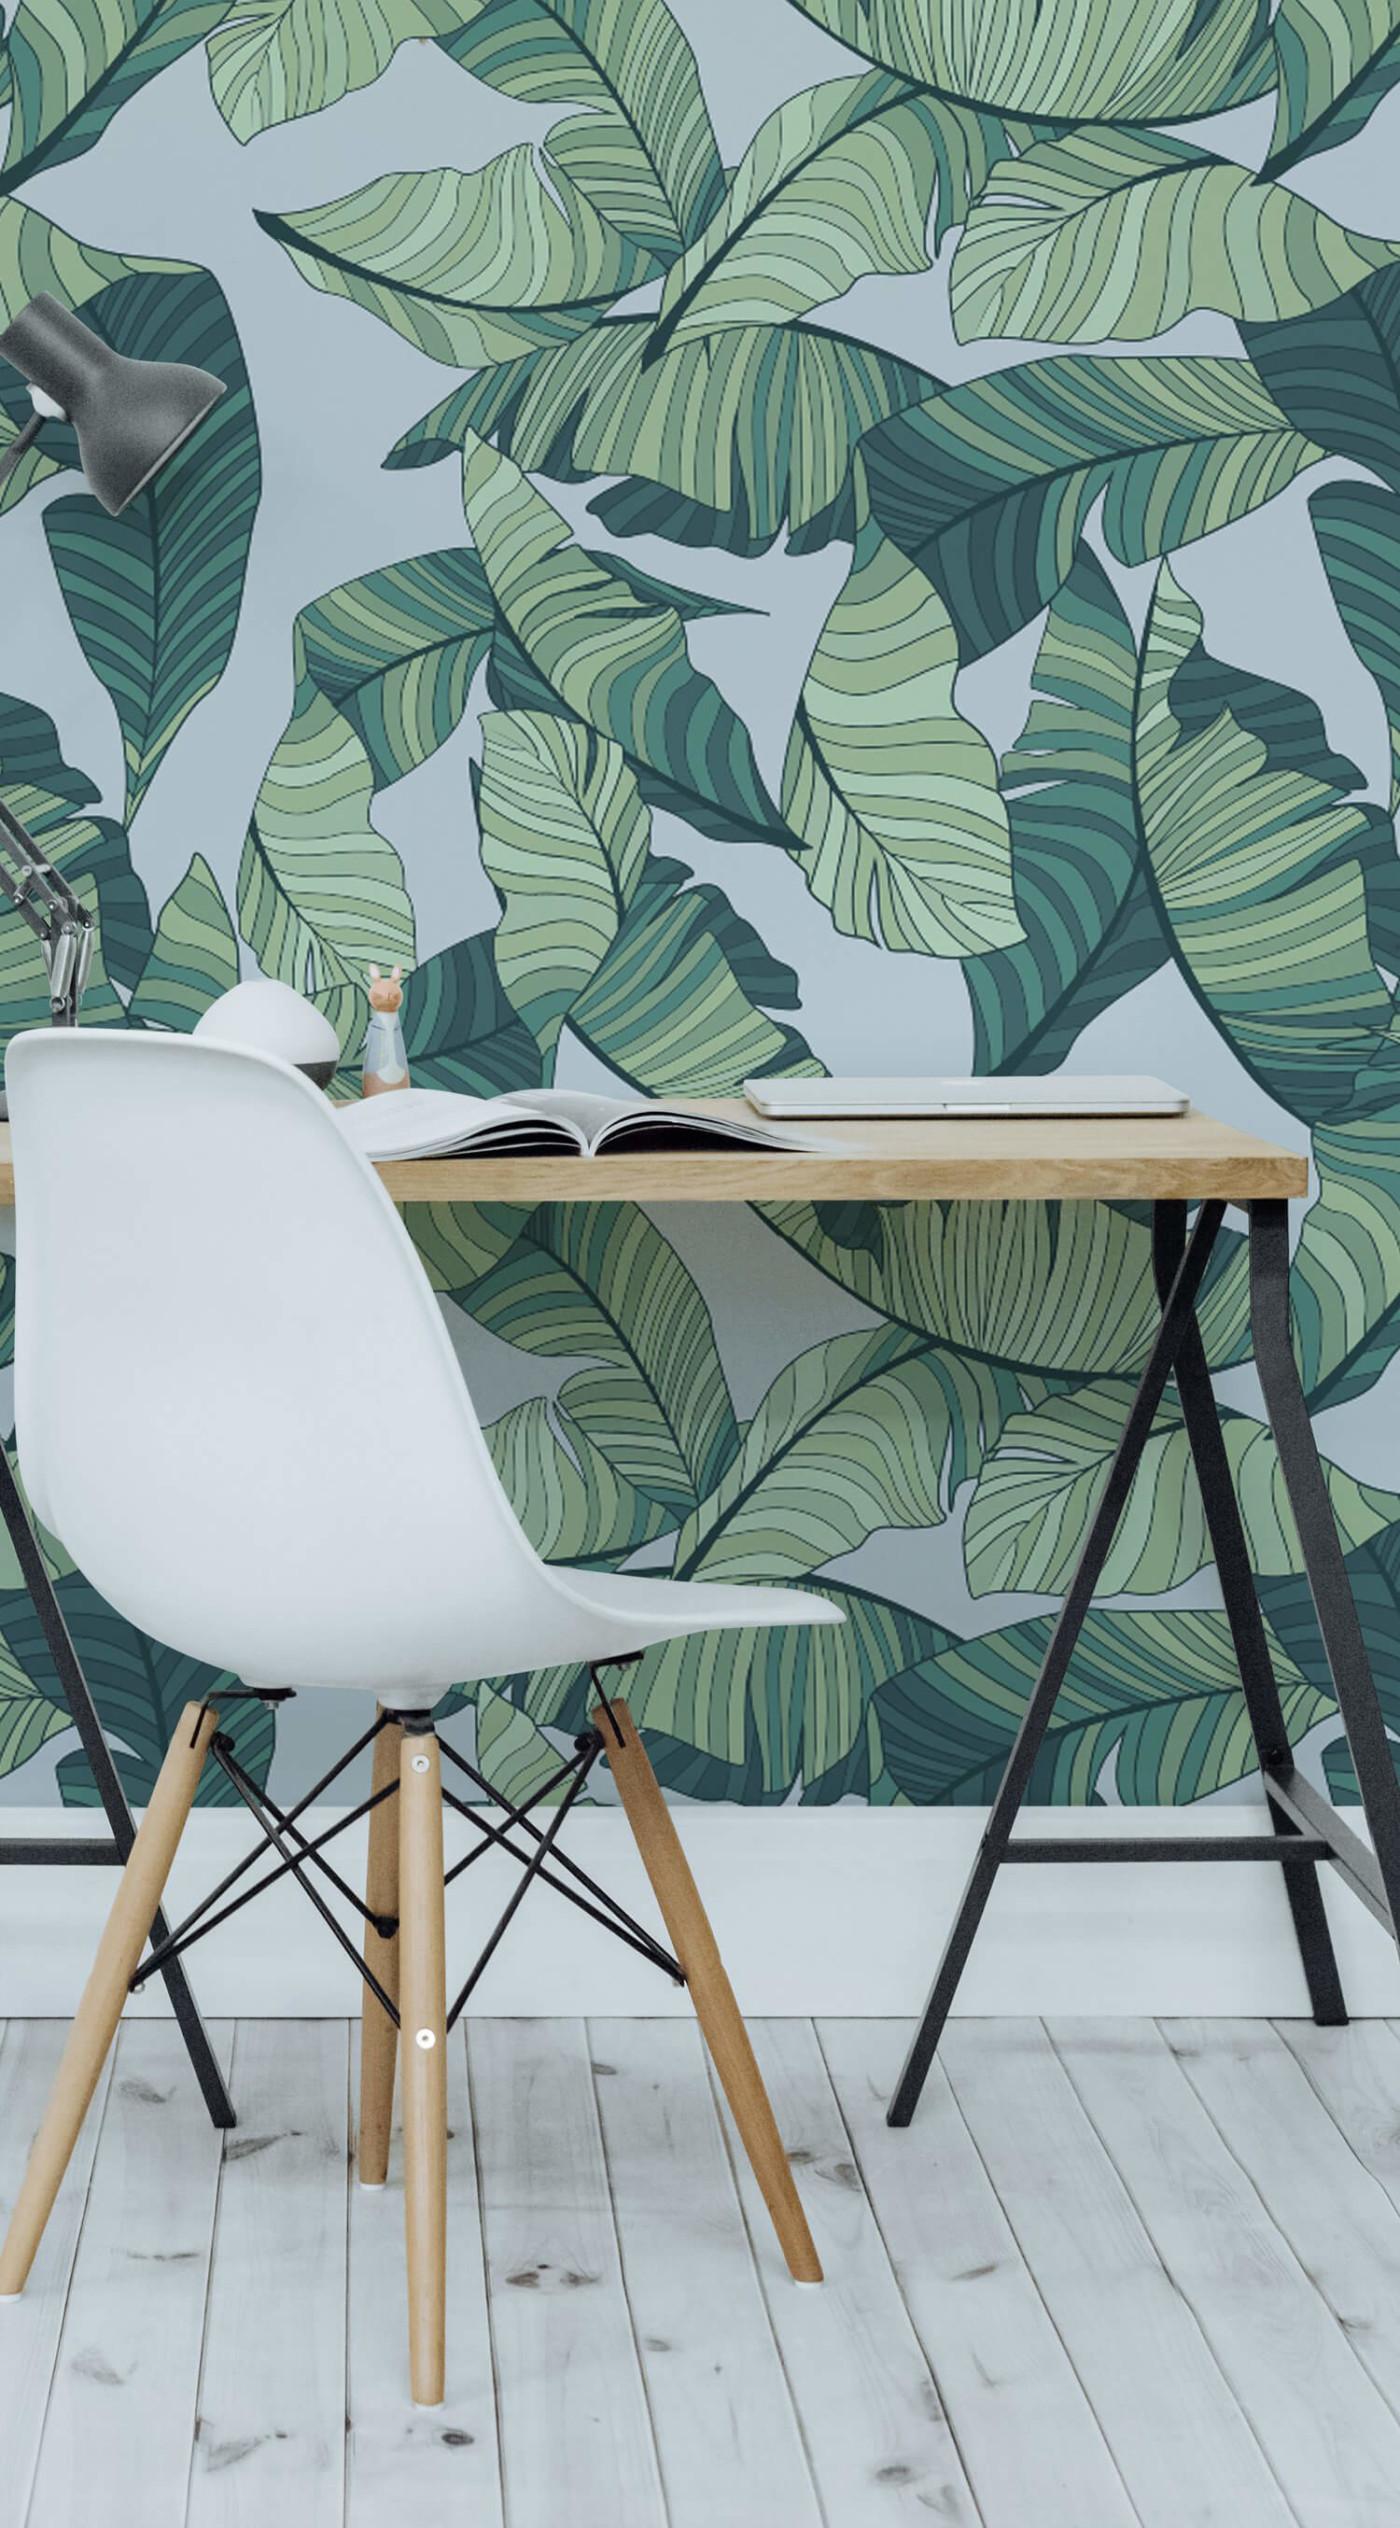 Blue-and-Green-Tropical-Desk-2-700x1264@2x.jpg